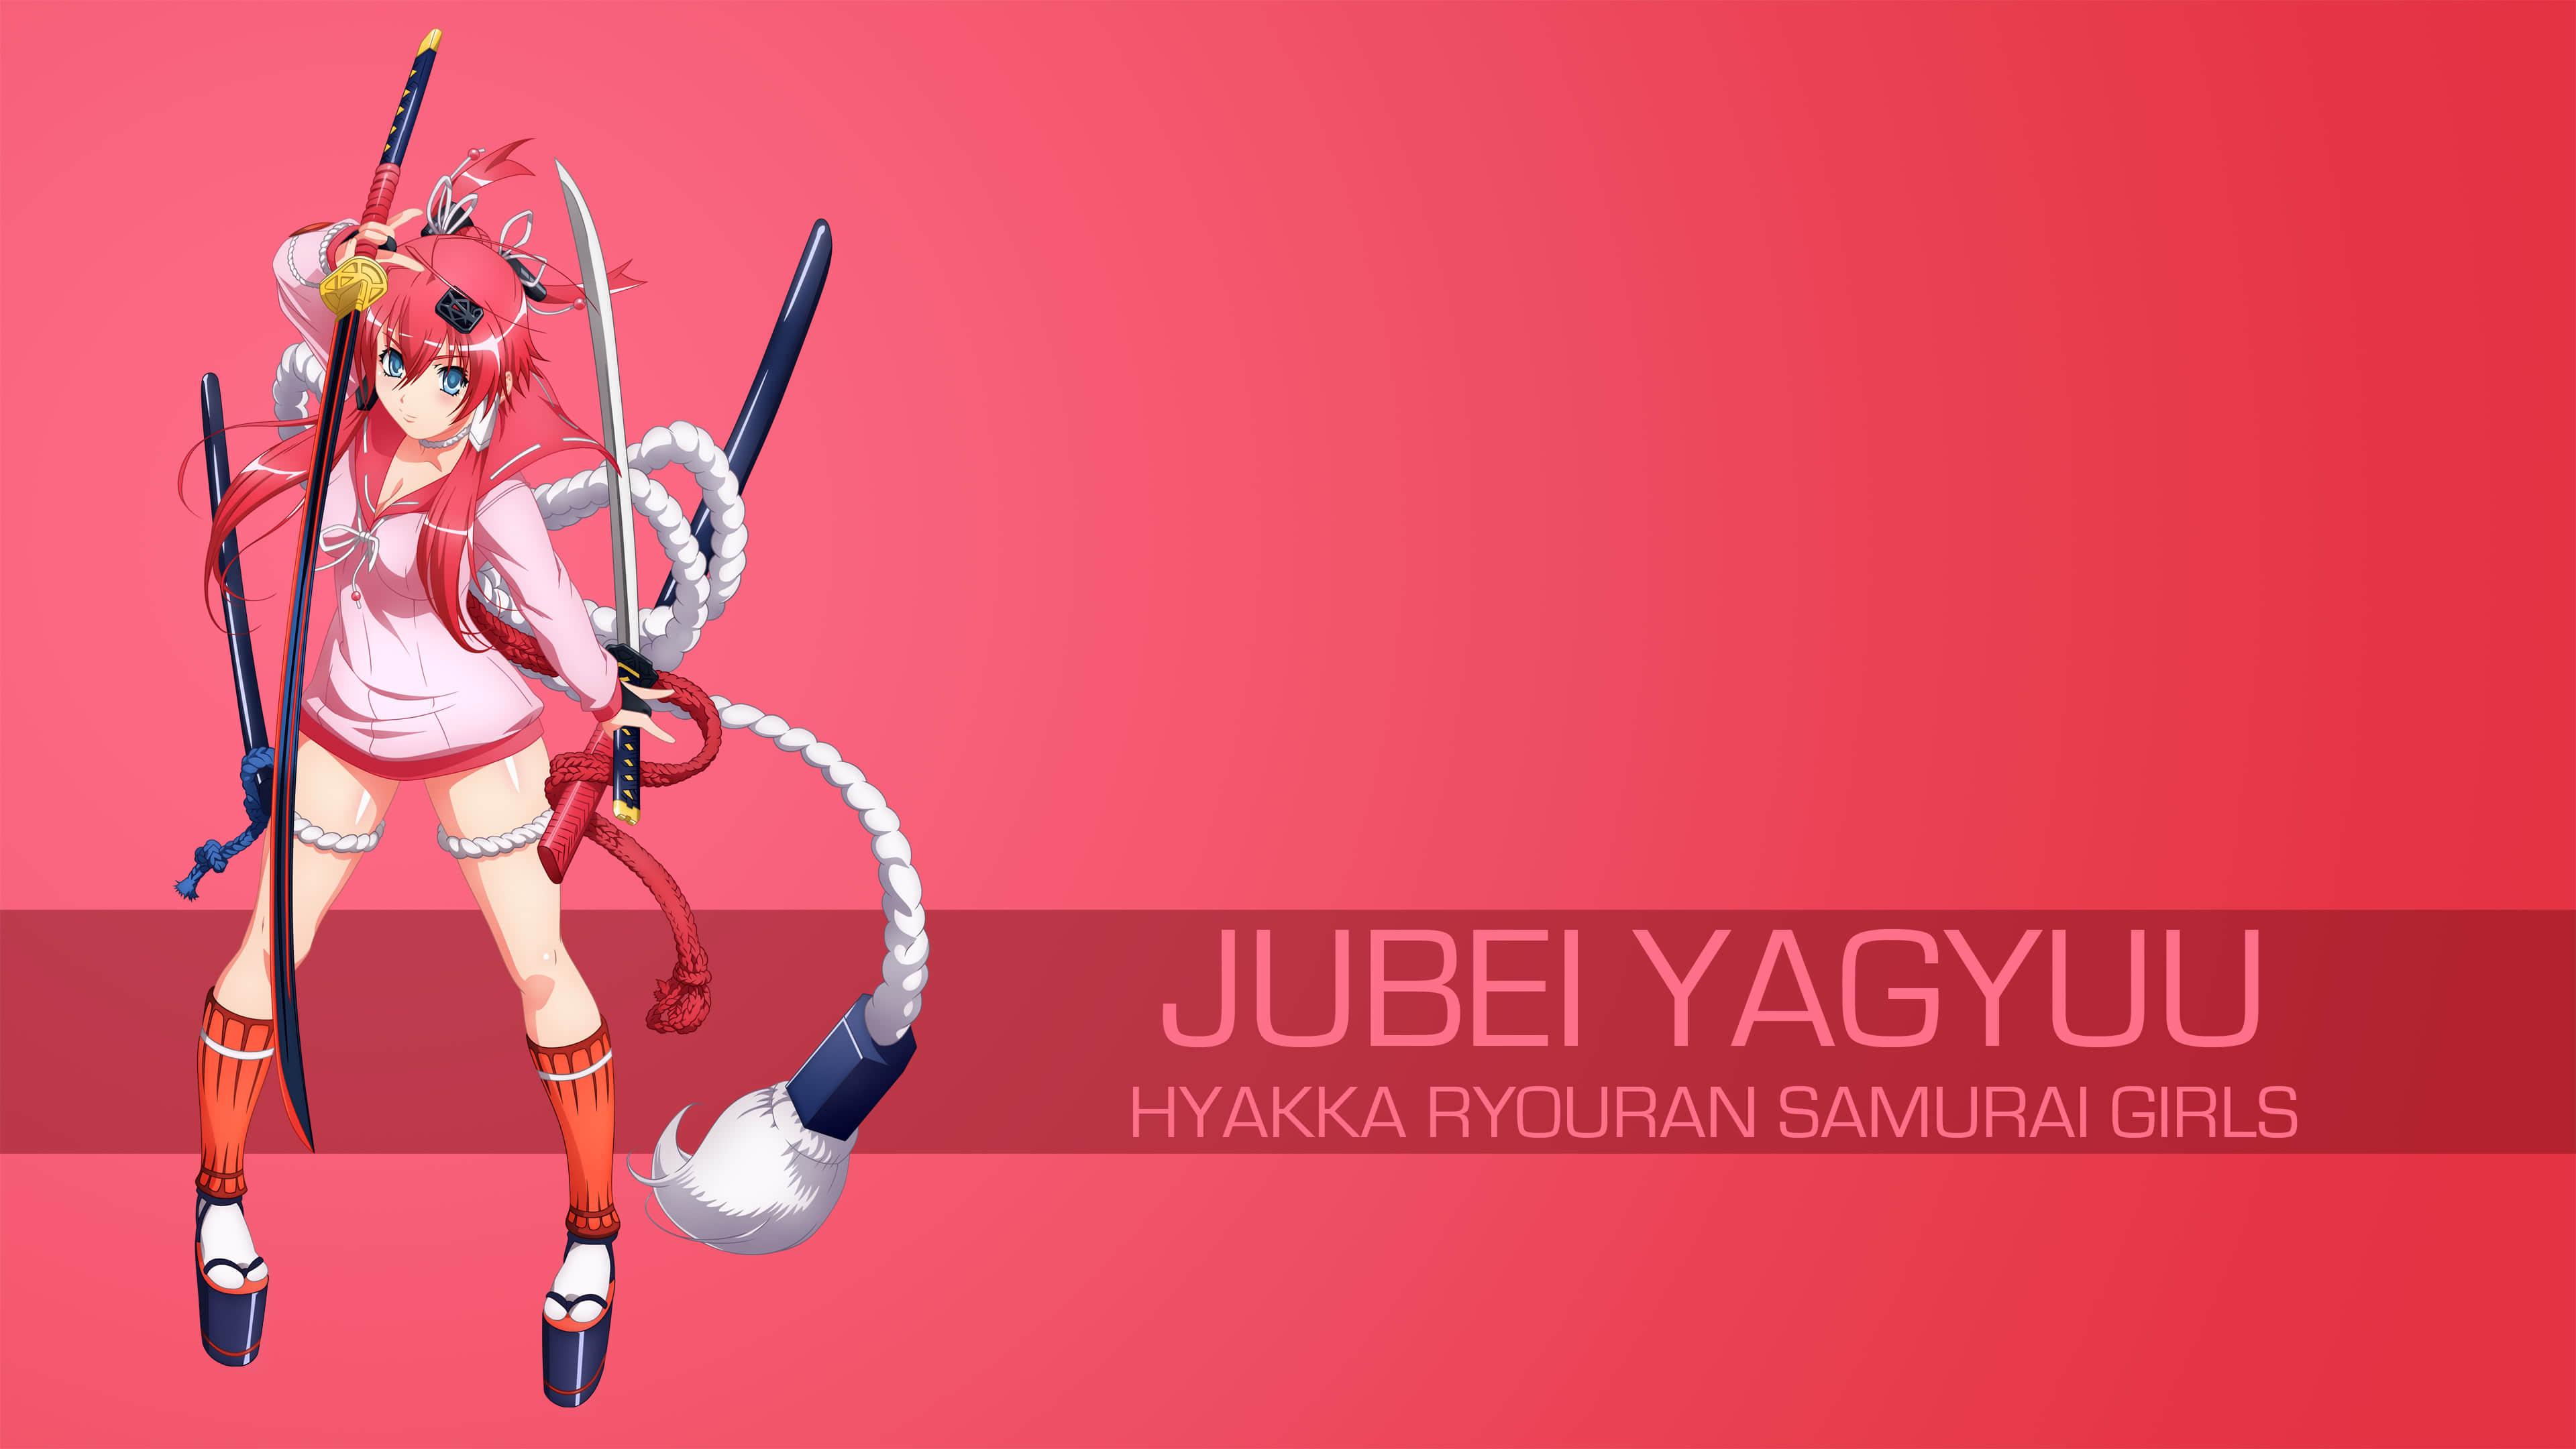 jubei yagyuu hyakka ryouran samurai girls uhd 4k wallpaper